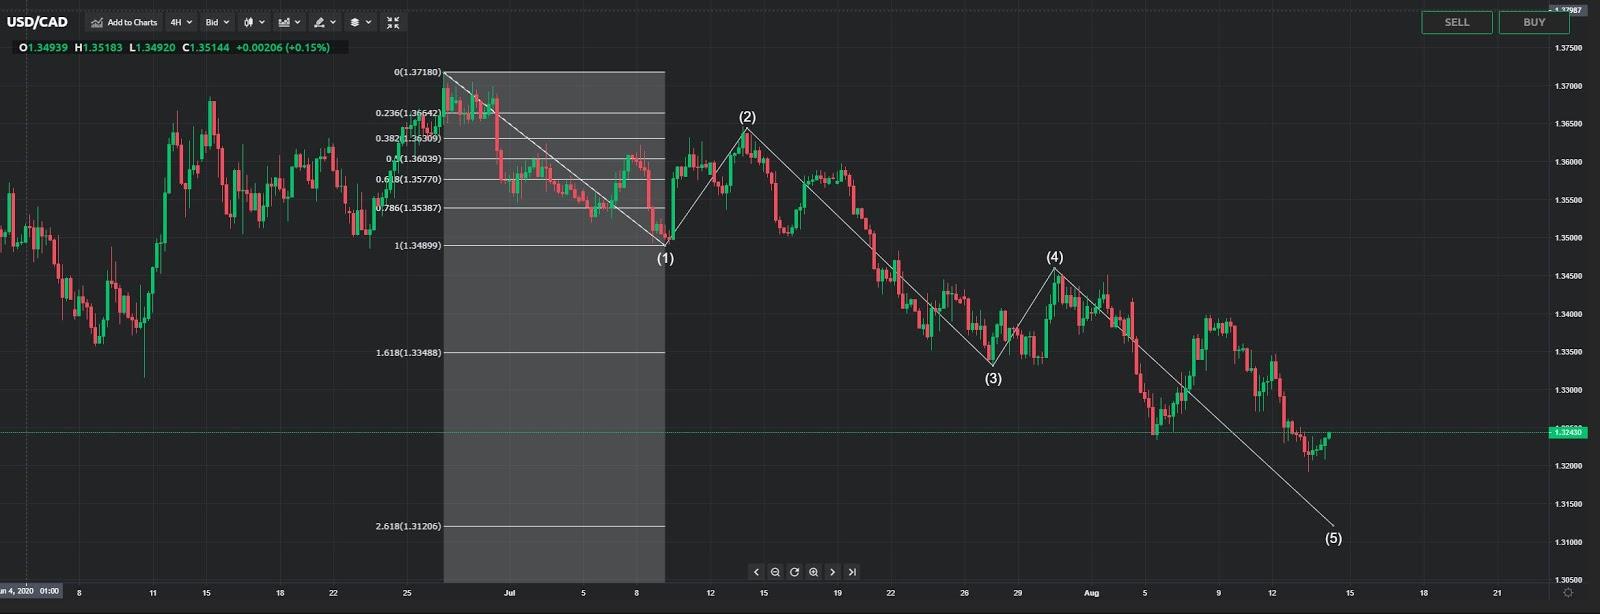 Технический анализ валютных пар USDCAD, USDJPY, EURAUD